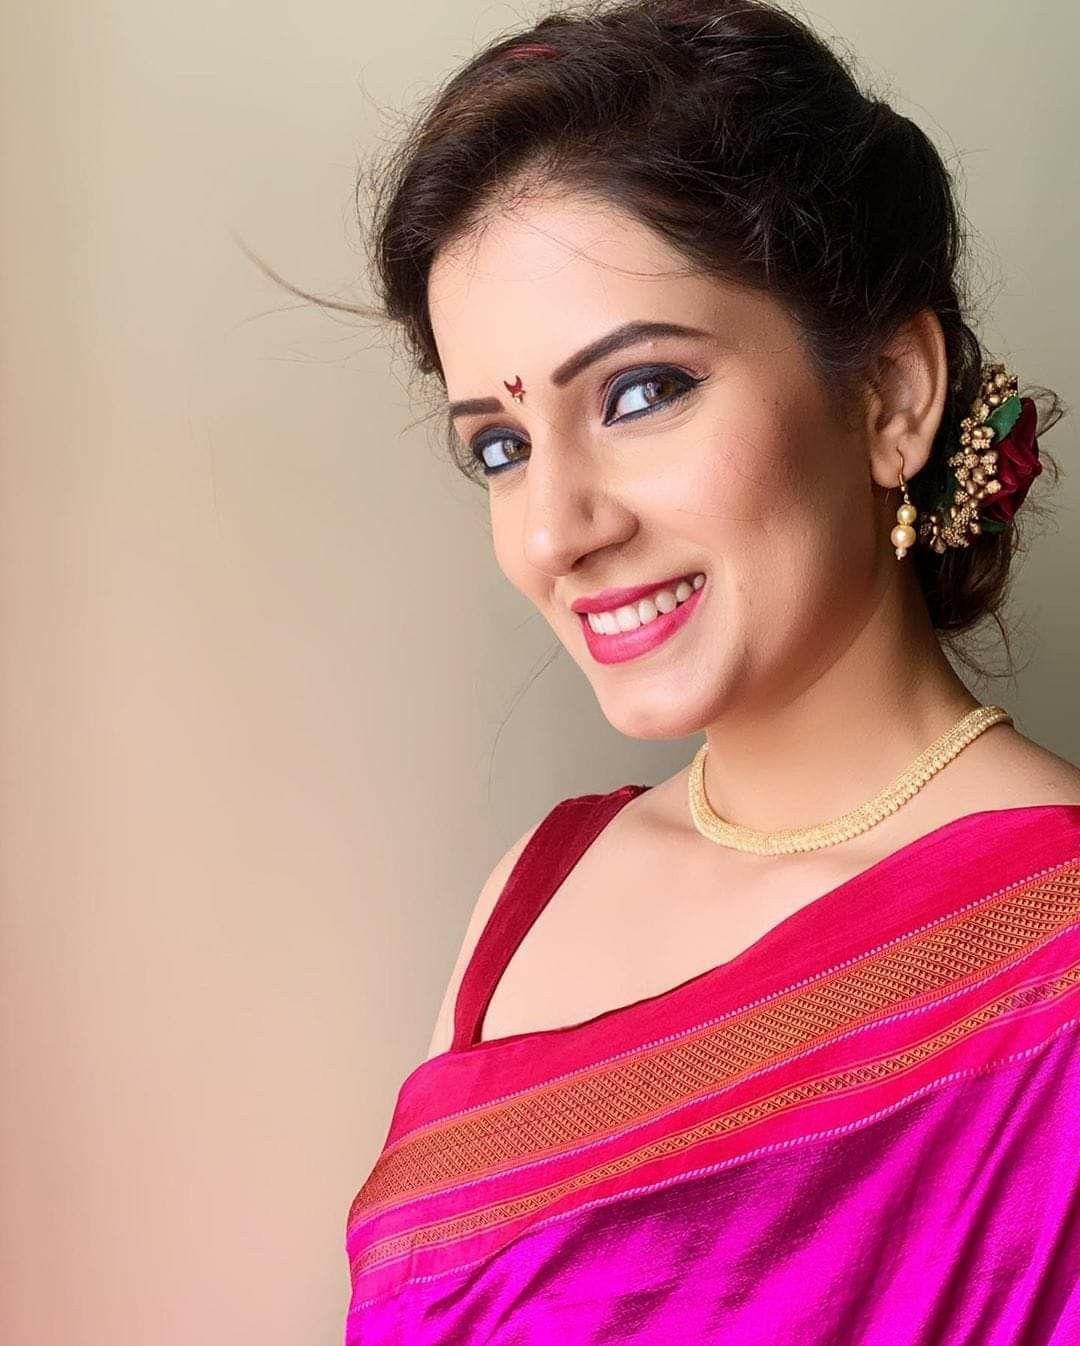 Pin by Smita Joshi on Beautiful face in 2020 Beauty girl